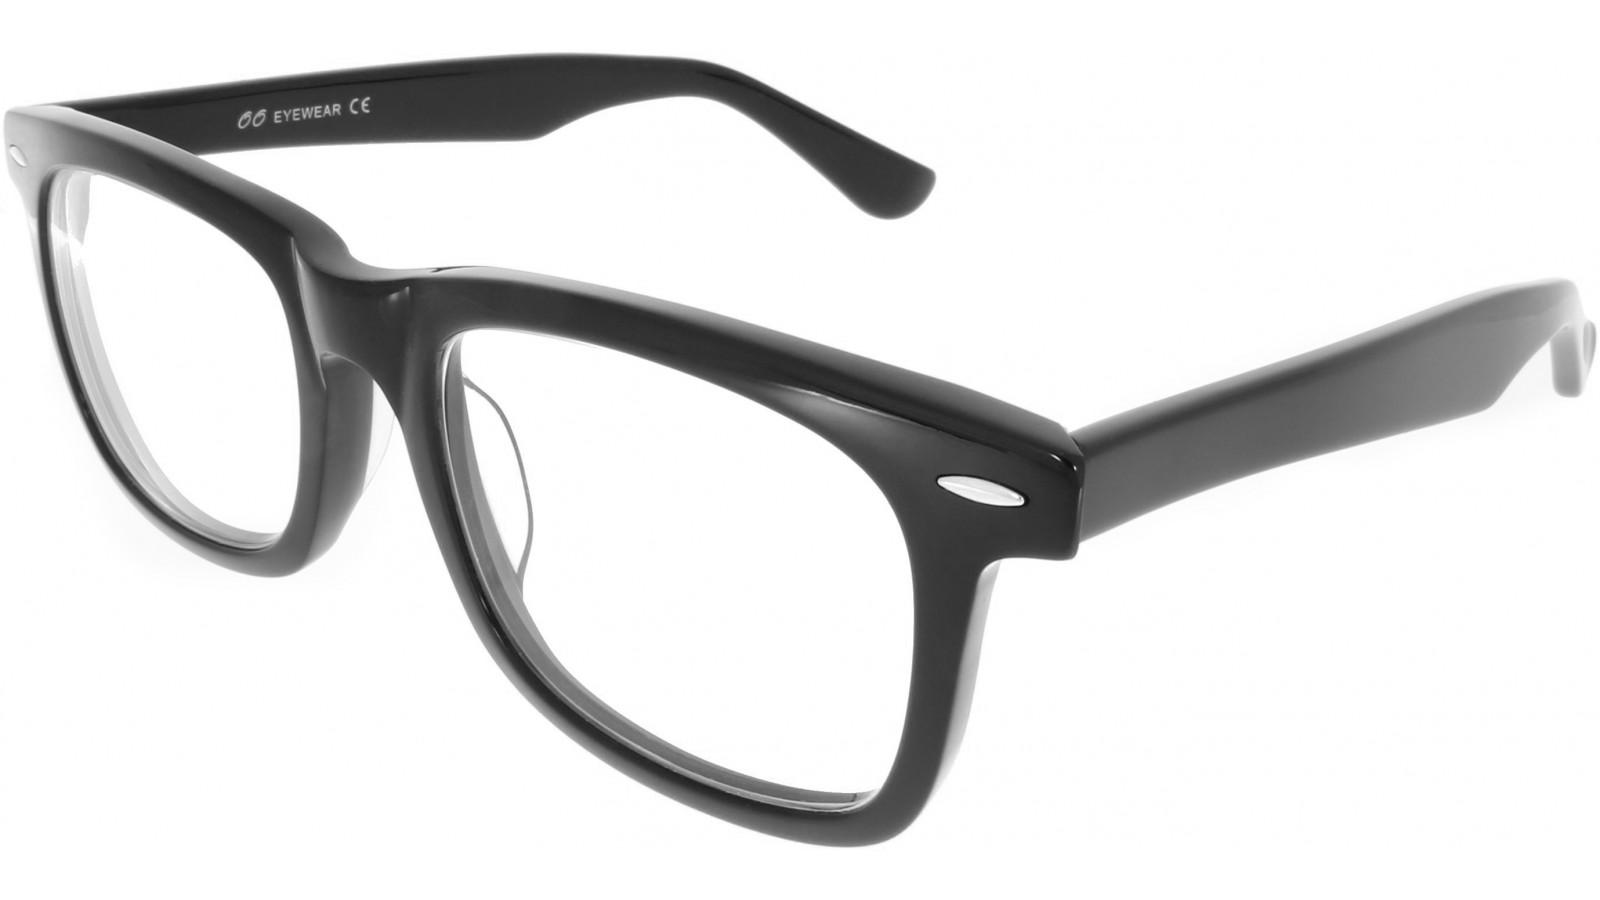 Übergroße eckige Brille im Wayfarer Stil aus Kunststoff in Schwarz ...